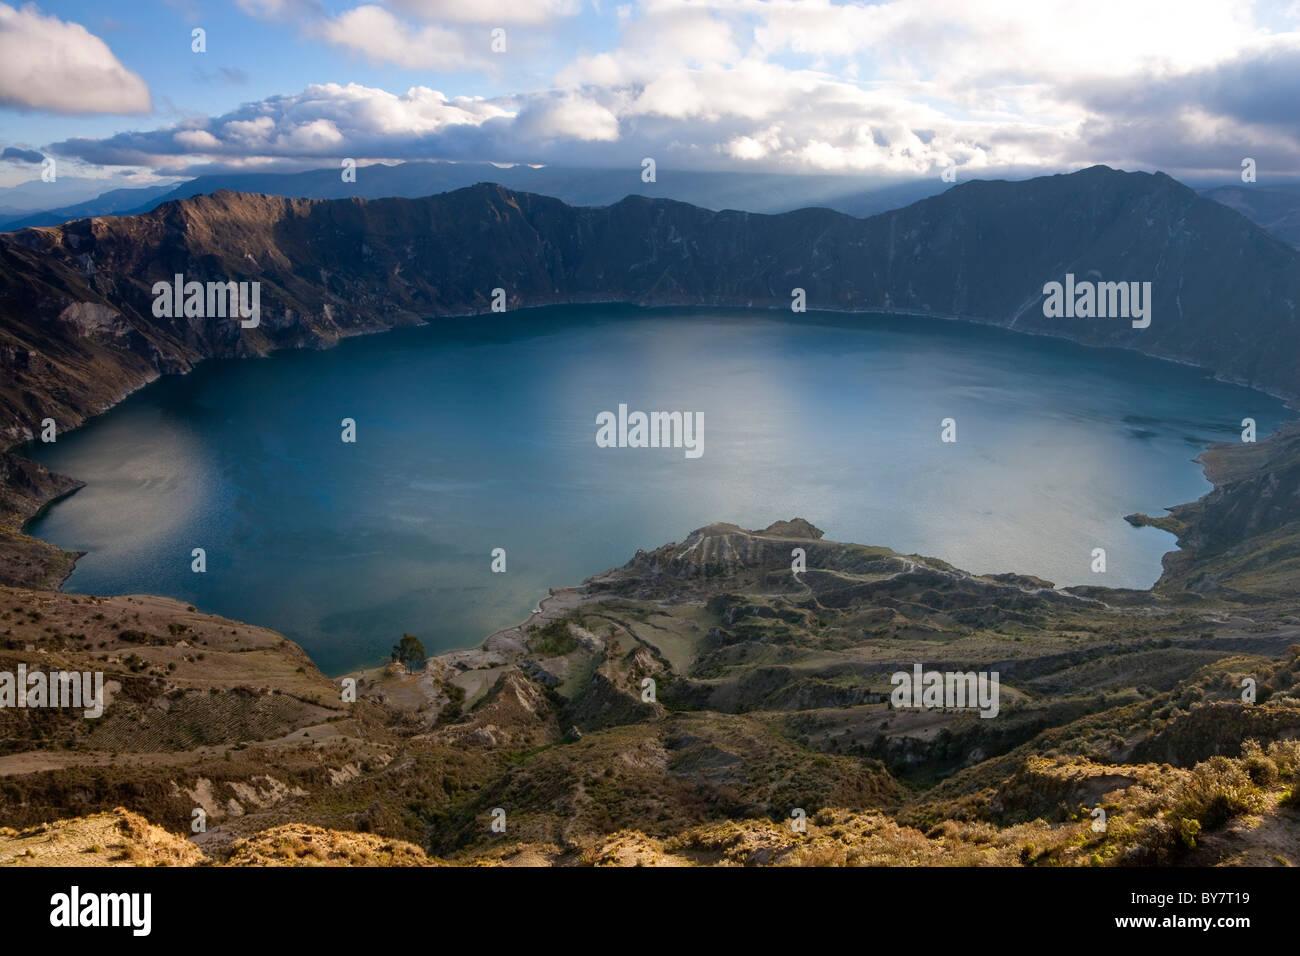 Vulkanische Quilotoa Kratersee Quilotoa Ecuador Stockbild